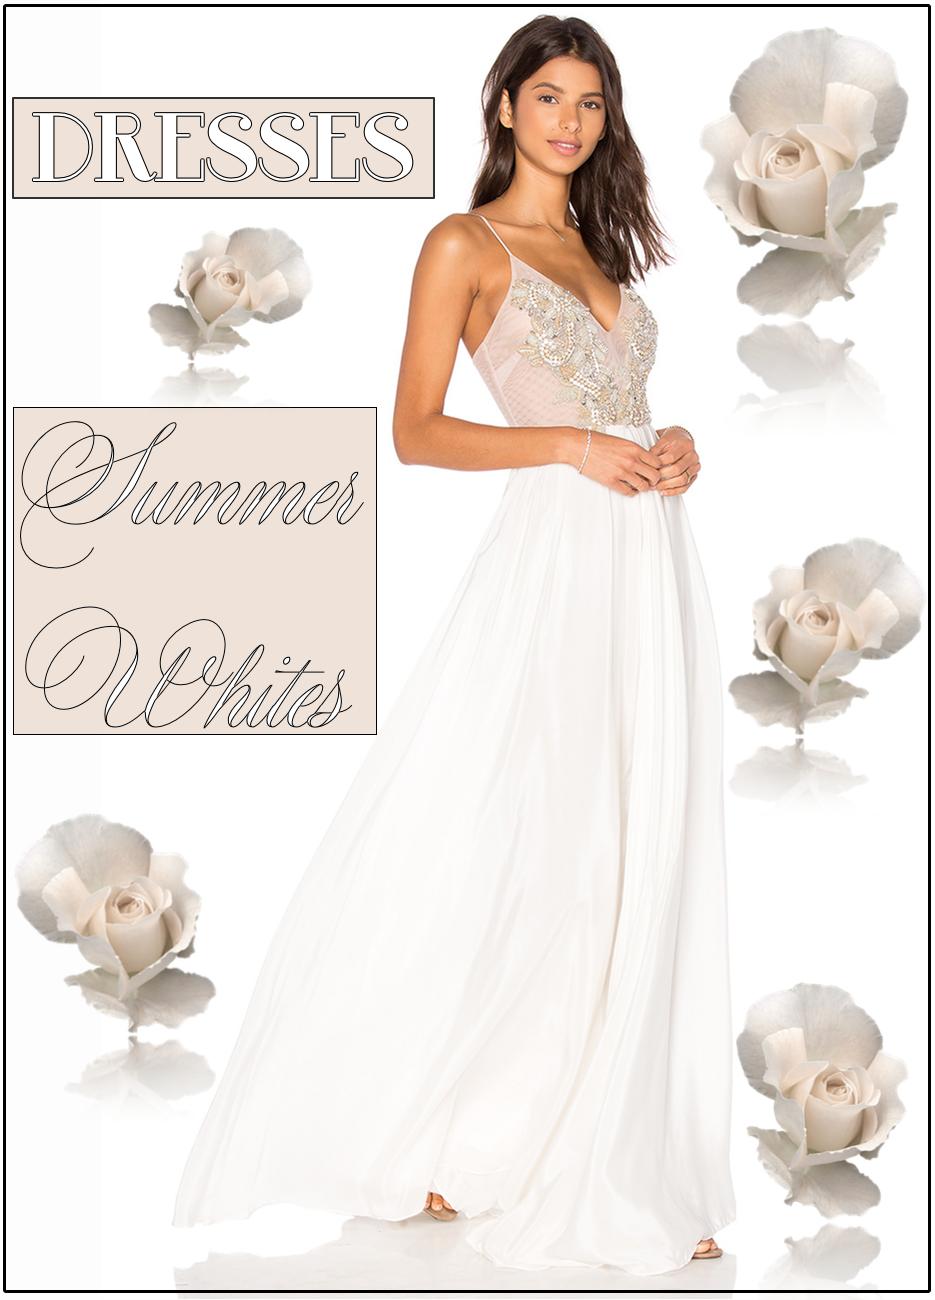 LURELLY Geneva Gown